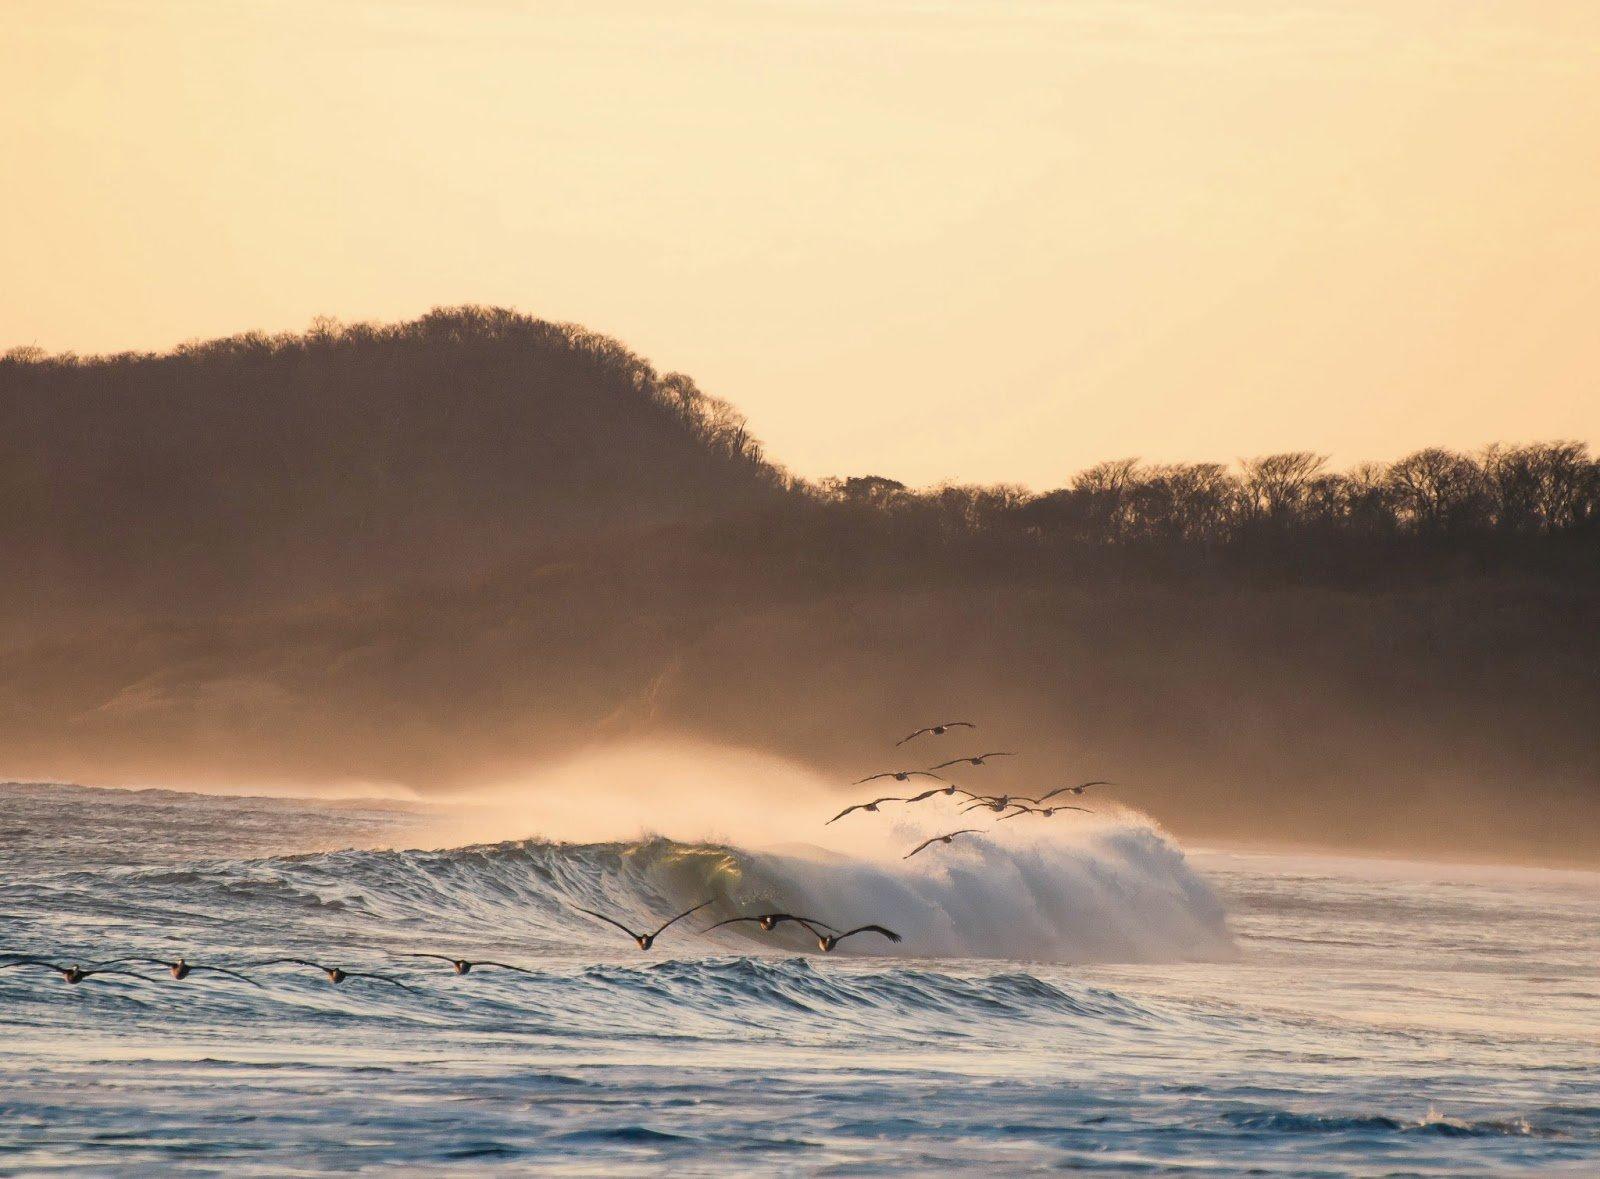 Popoyo Nicaragua Surf